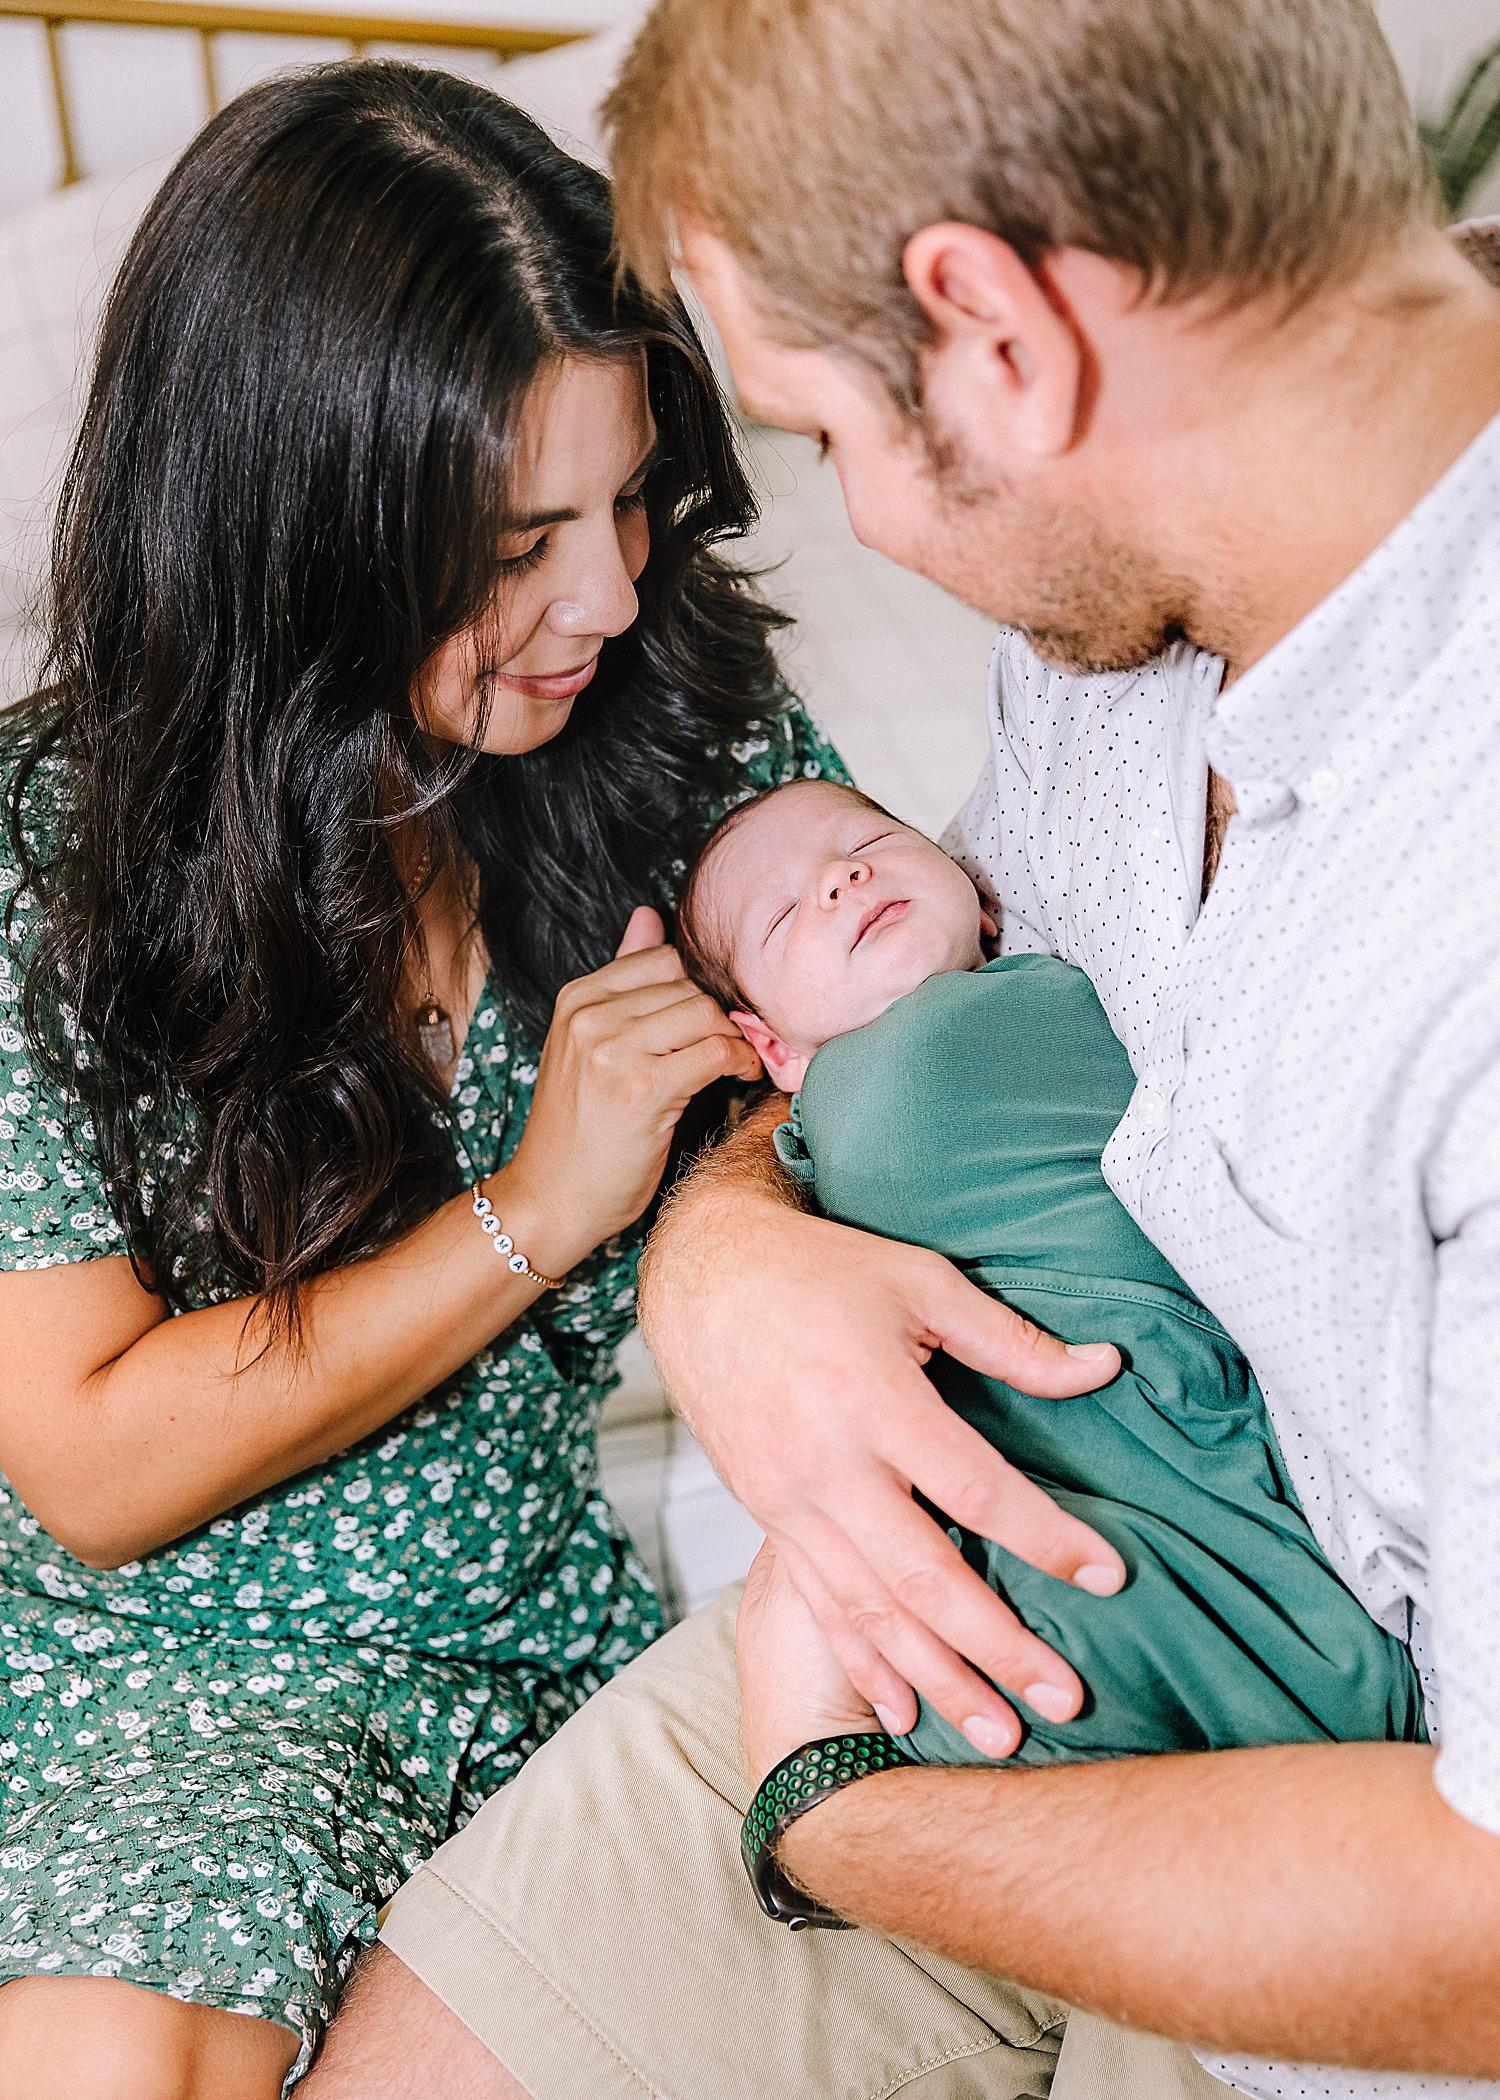 Carly-Barton-Photography-Lifestyle-Newborn-Photographer-Brothers-Family-Photos-Texas_0005.jpg